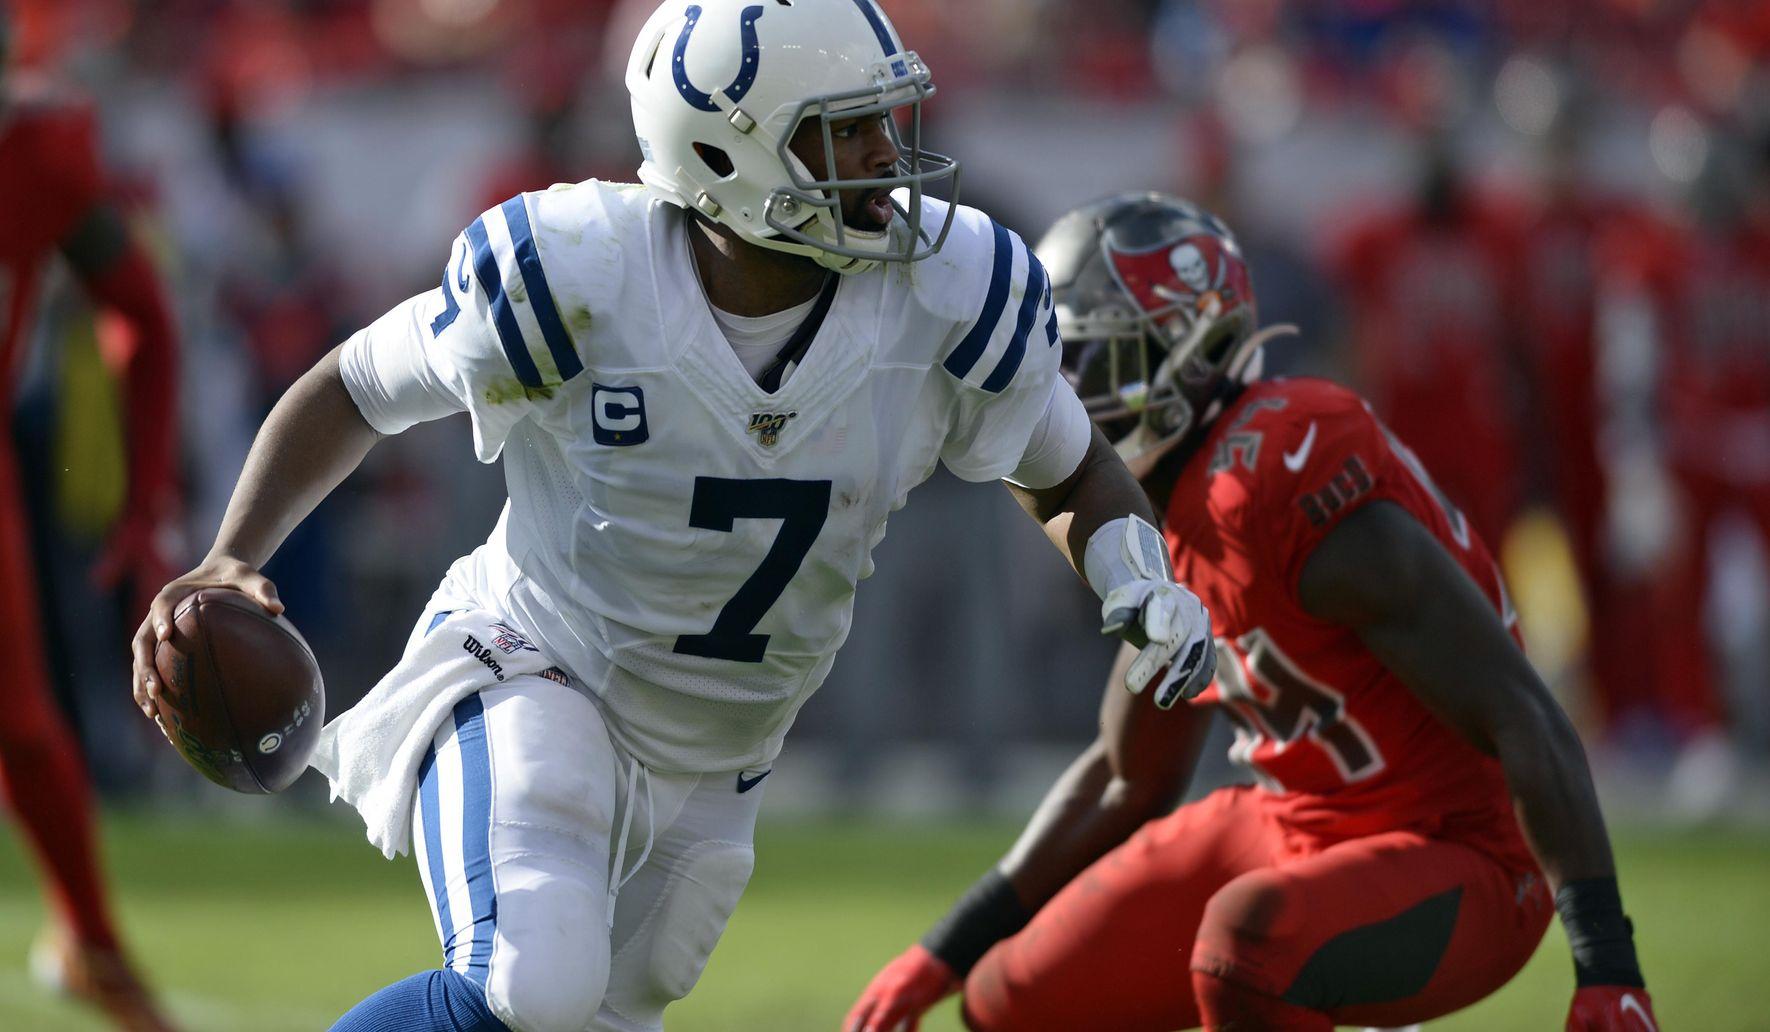 Colts_buccaneers_football_06845_c0-176-4200-2624_s1770x1032